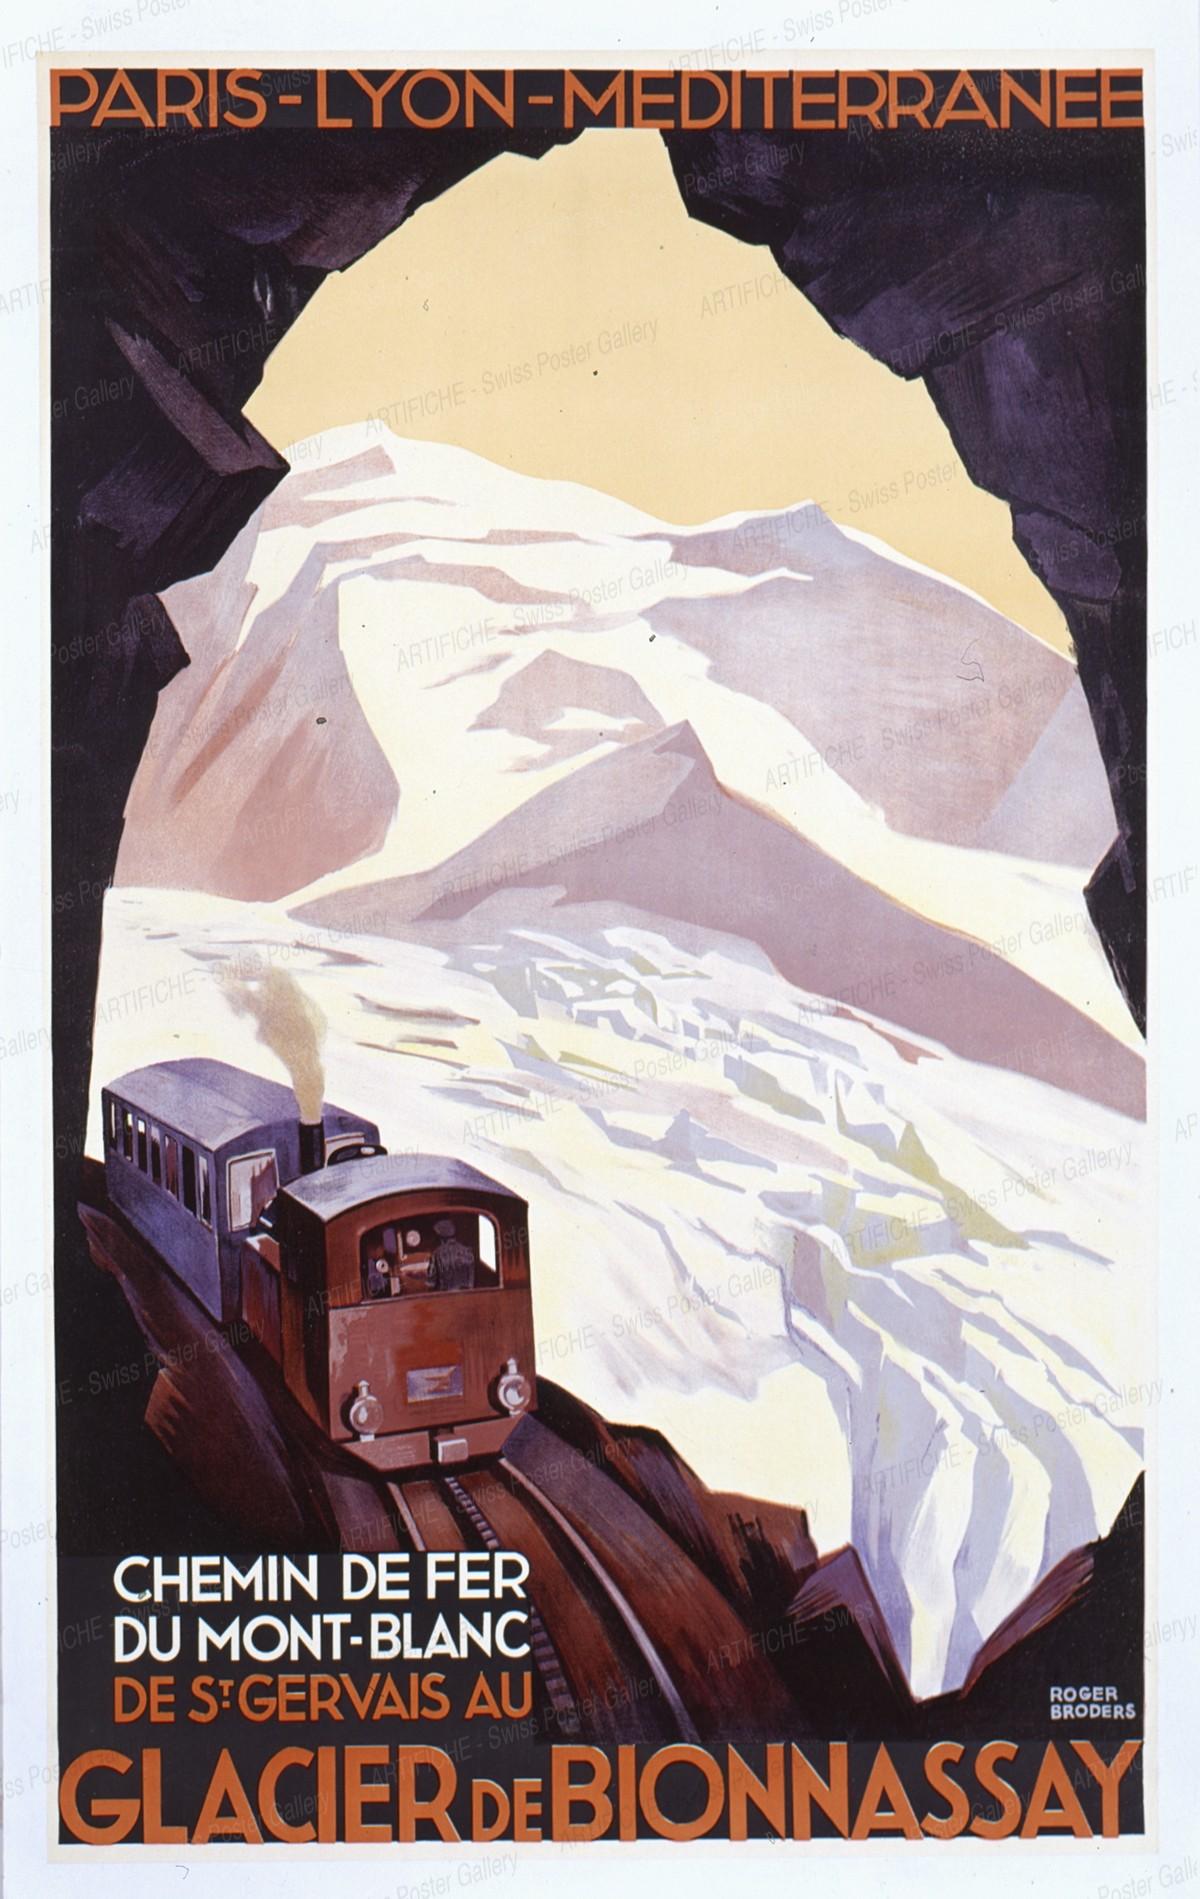 Glacier de Bionnassay, Roger Broders